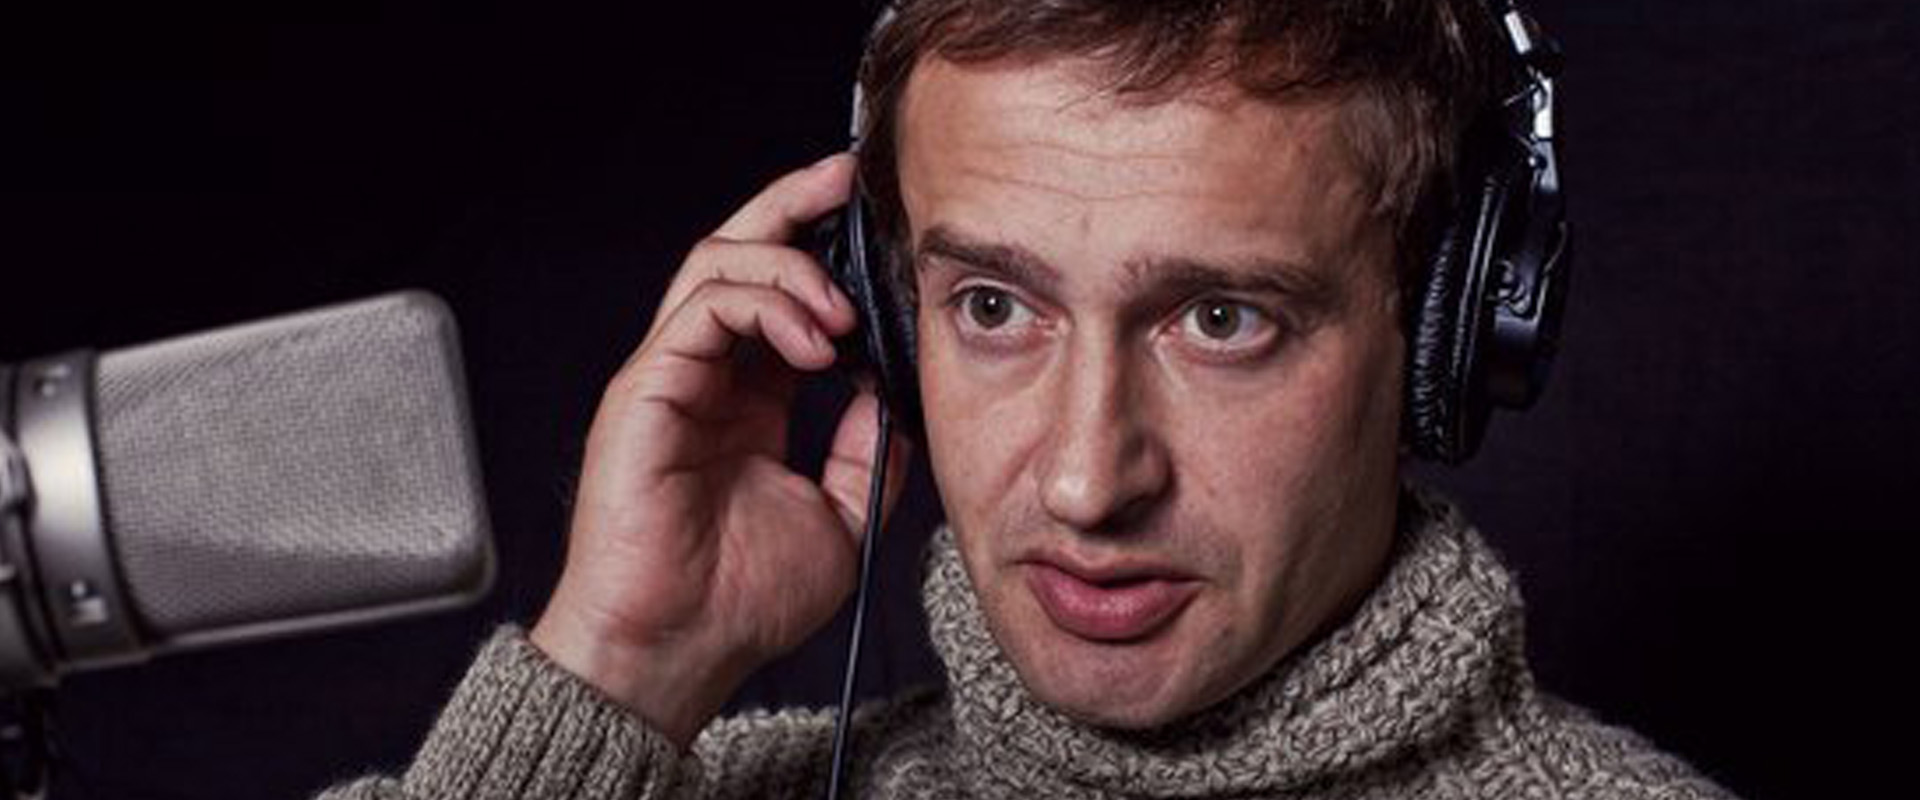 Konstantin Khabenskiy on the Dubbing